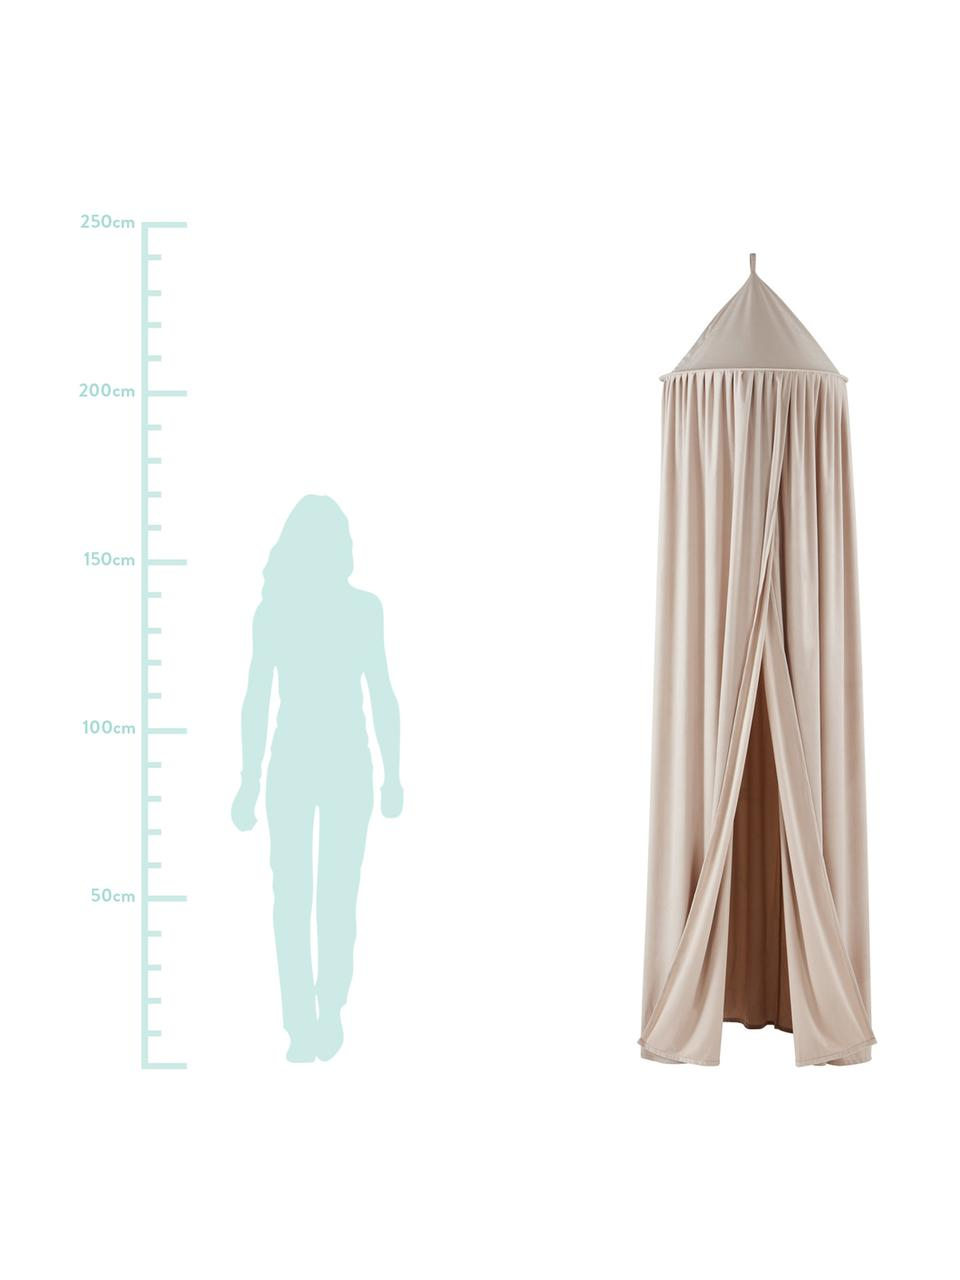 Betthimmel Savannah, 100% Polyester., Beige, Ø 55 x 240 cm